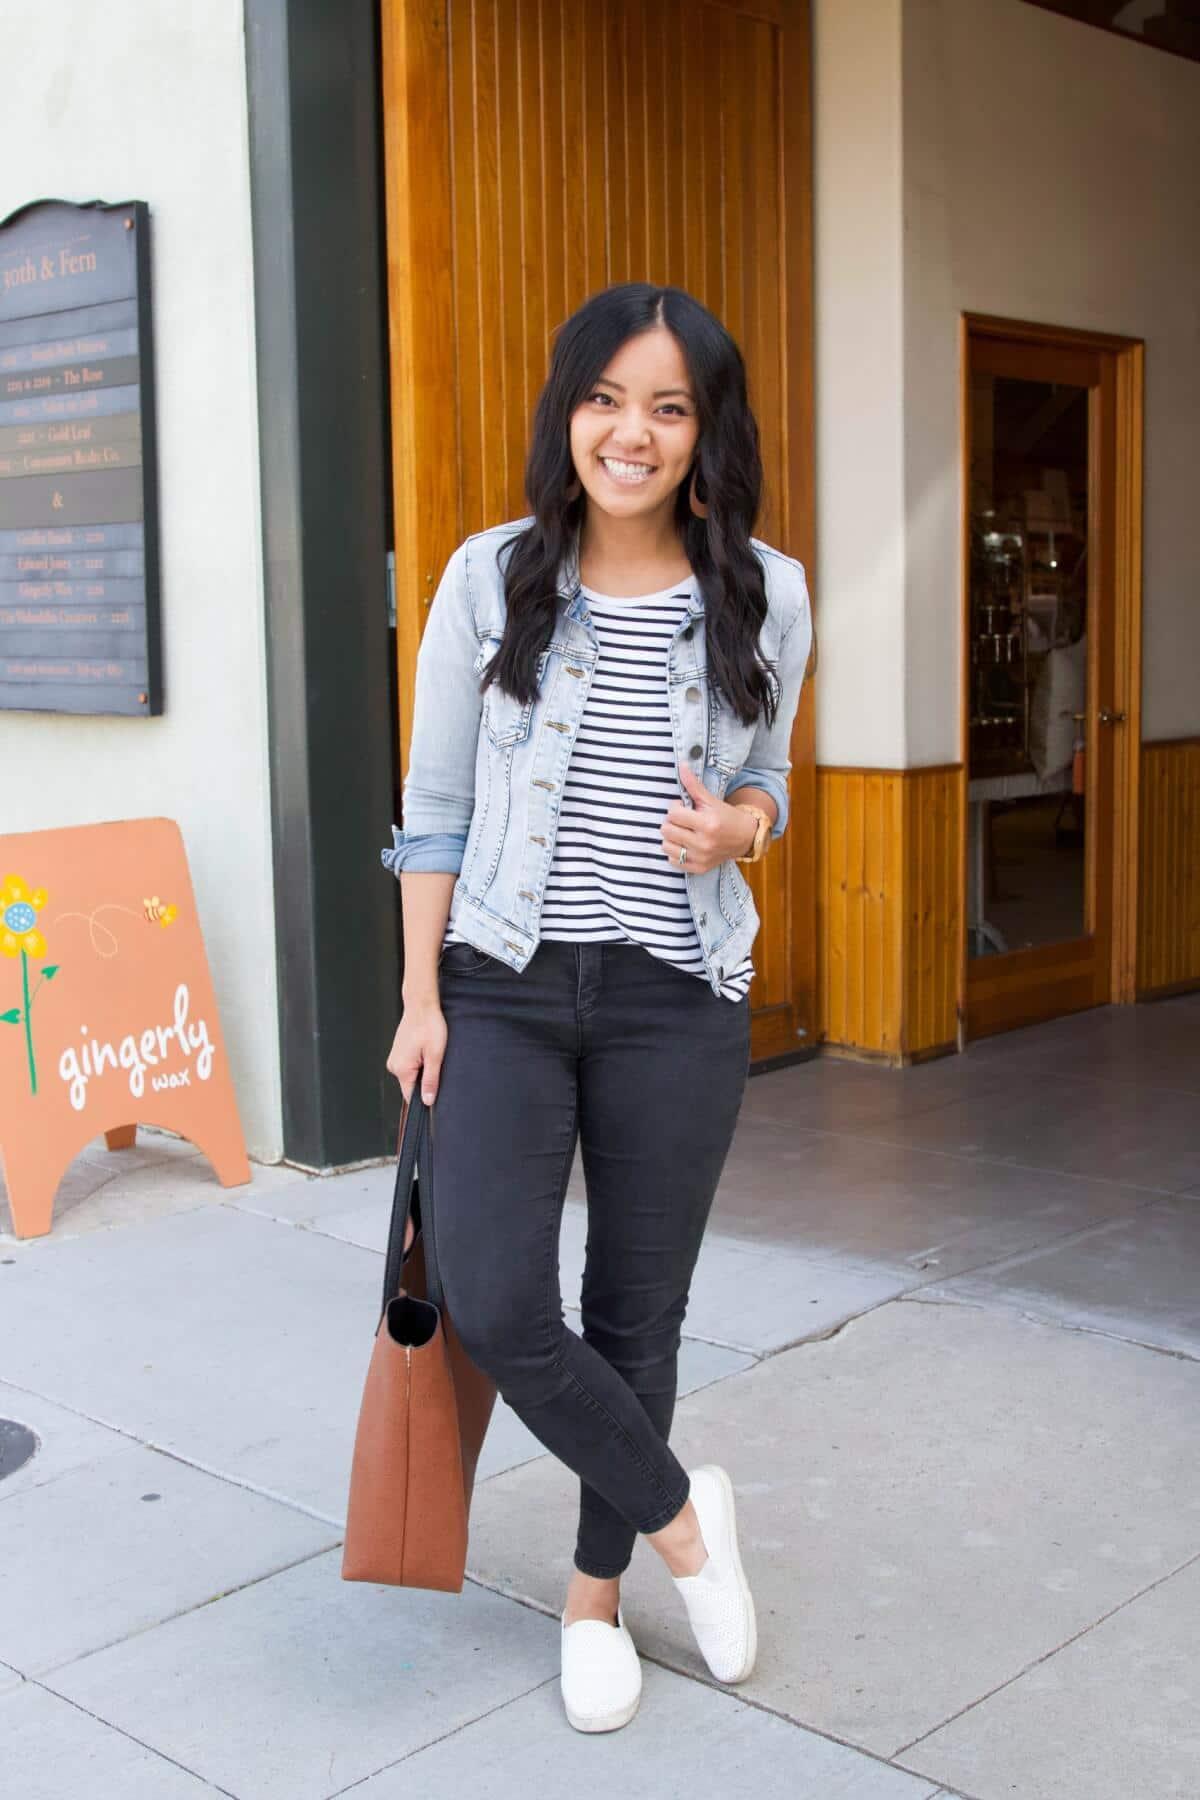 Classic Outfit: striped tee + black jeans + denim jacket + white sneakers + tan earrings + tan tote